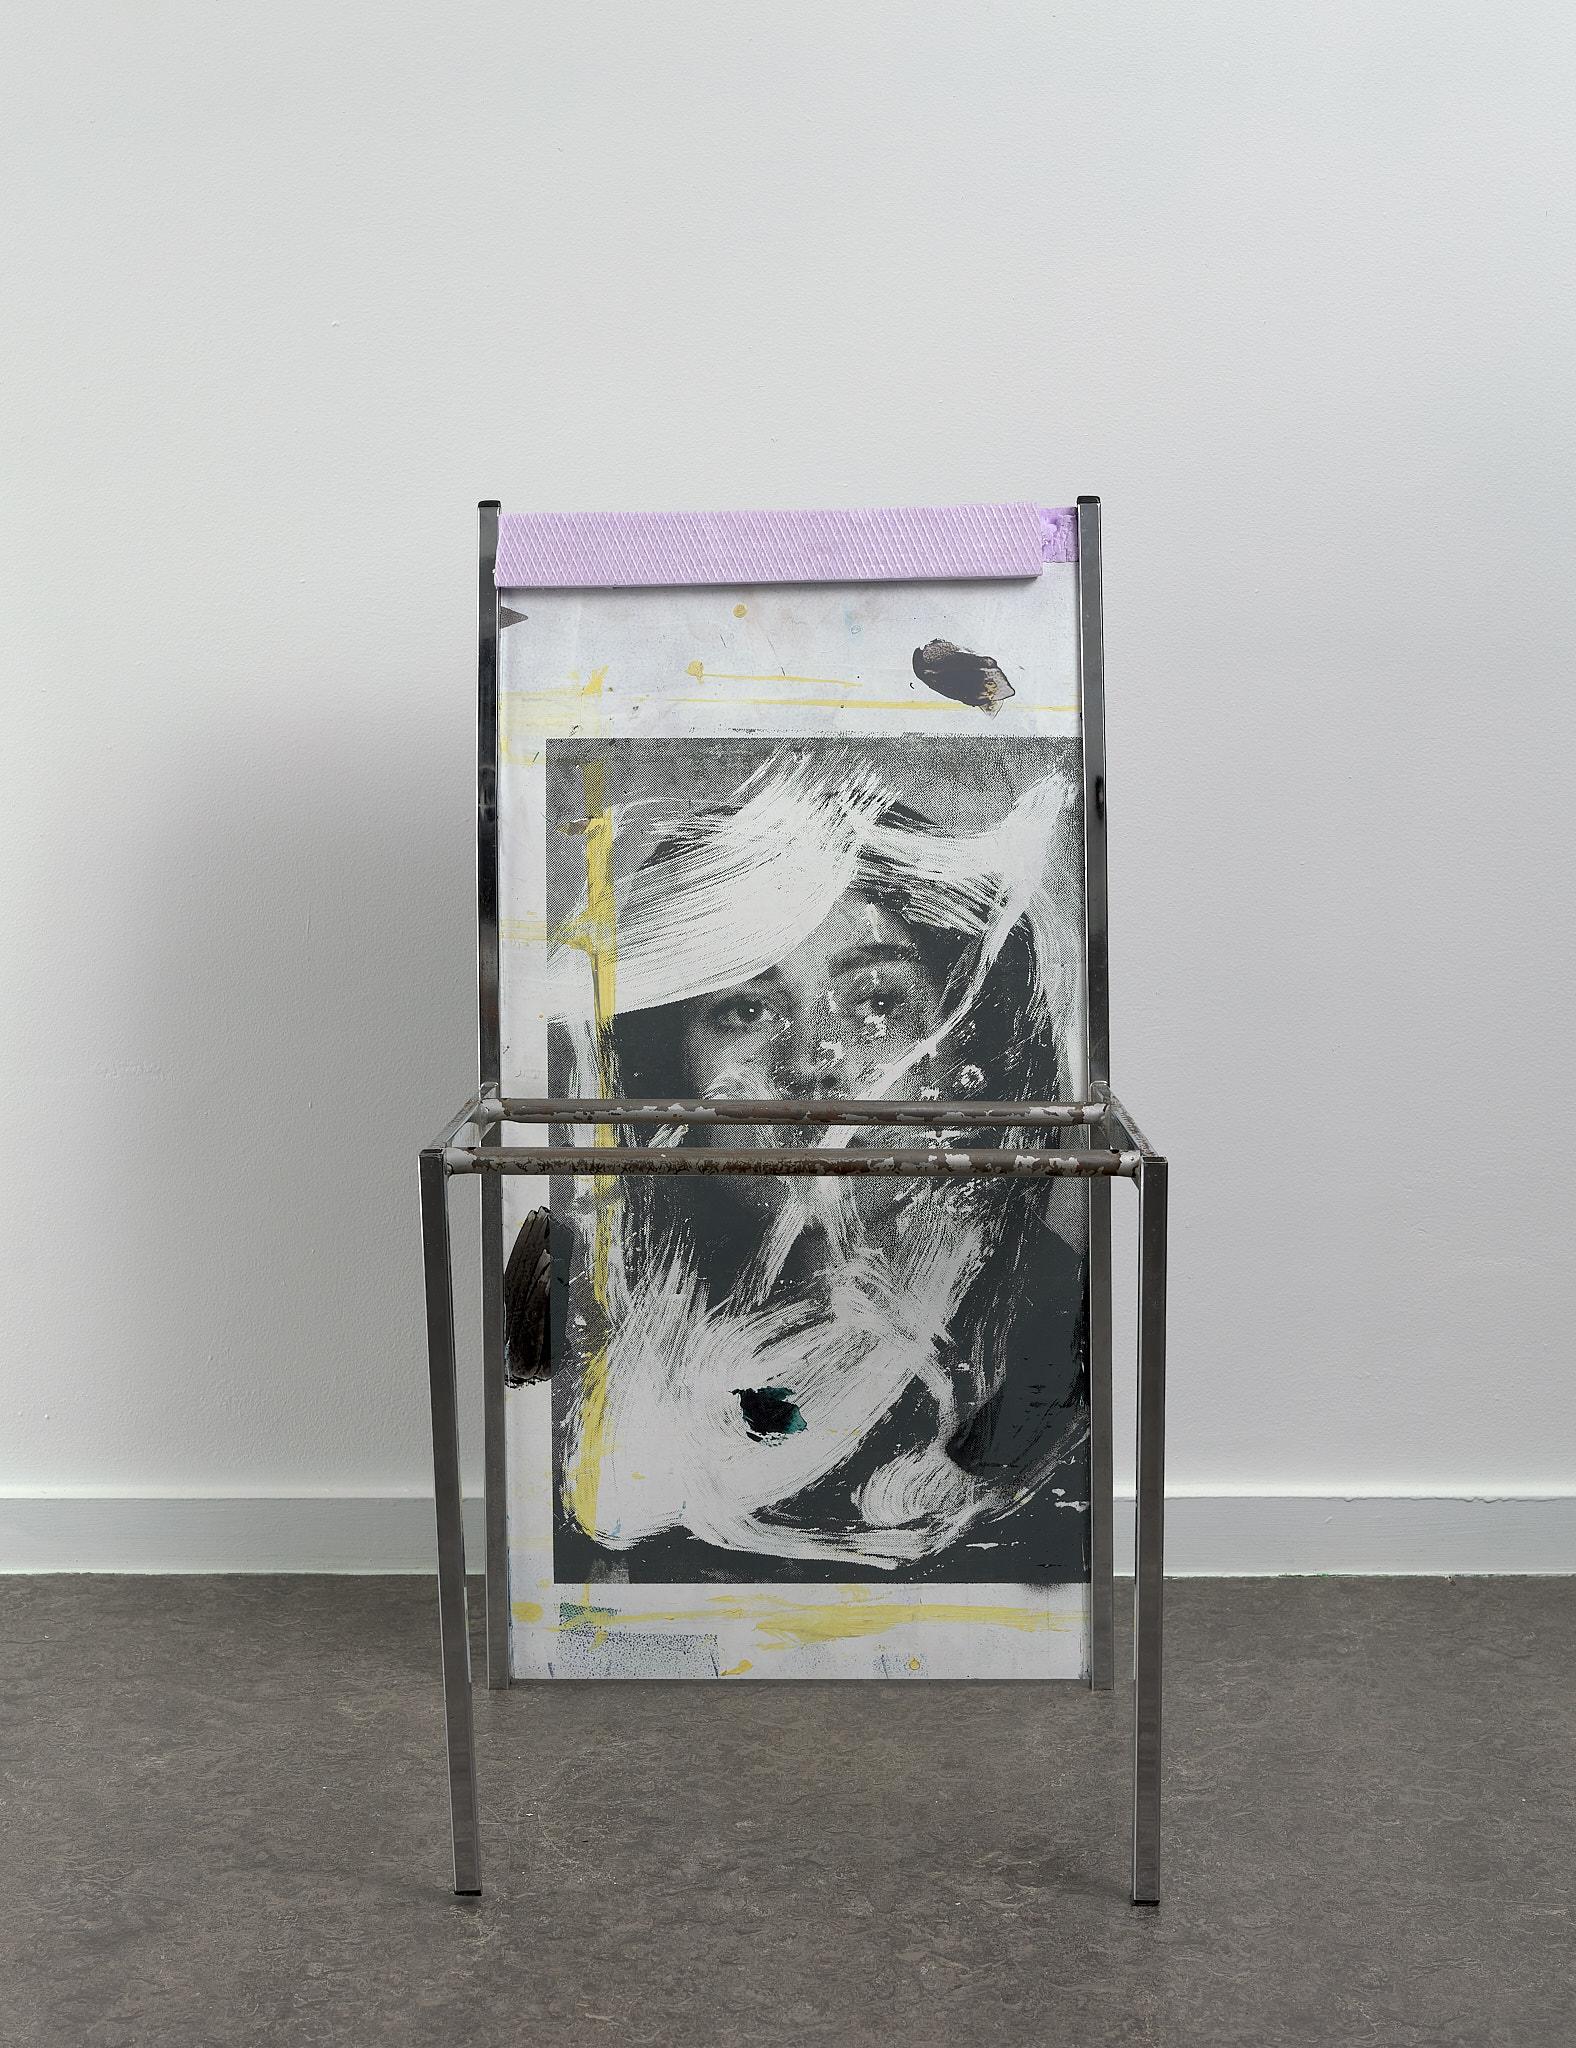 Untitled (merel), 2021 silkscreen, acrylic, insulation board, PVC and metal 80 42 46cm